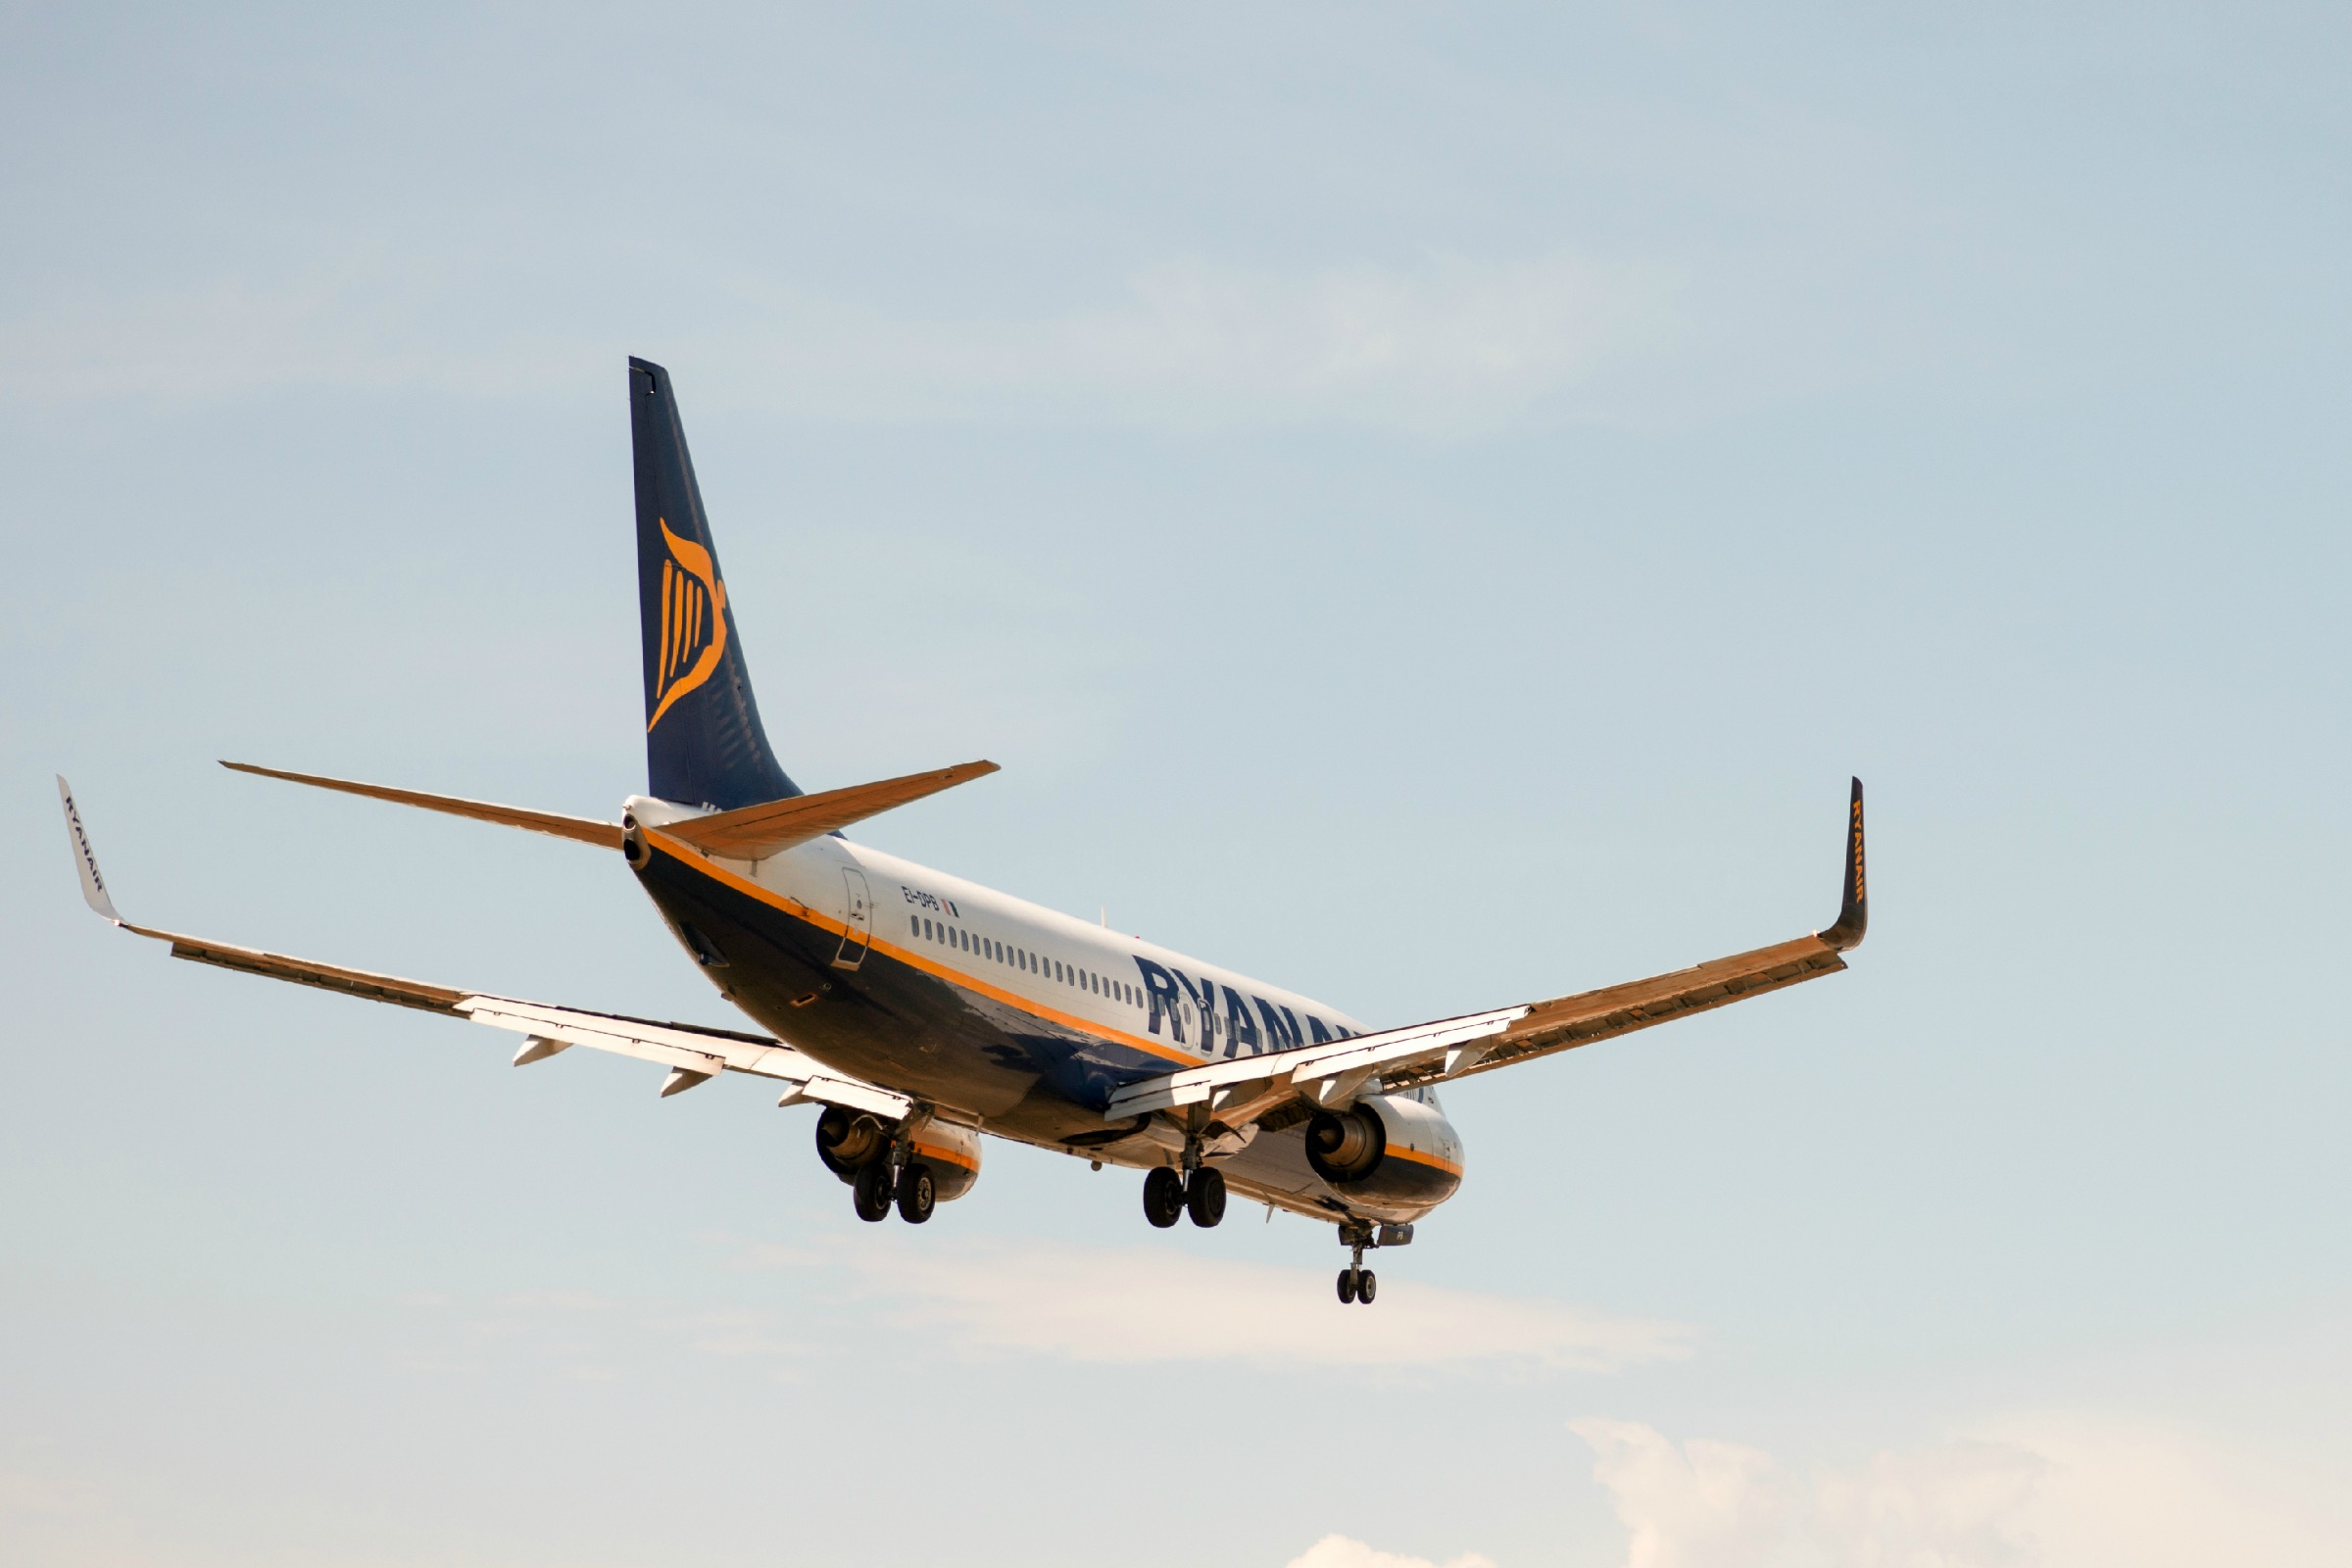 Vol de Ryanair - pisaphotography / Shutterstock.com